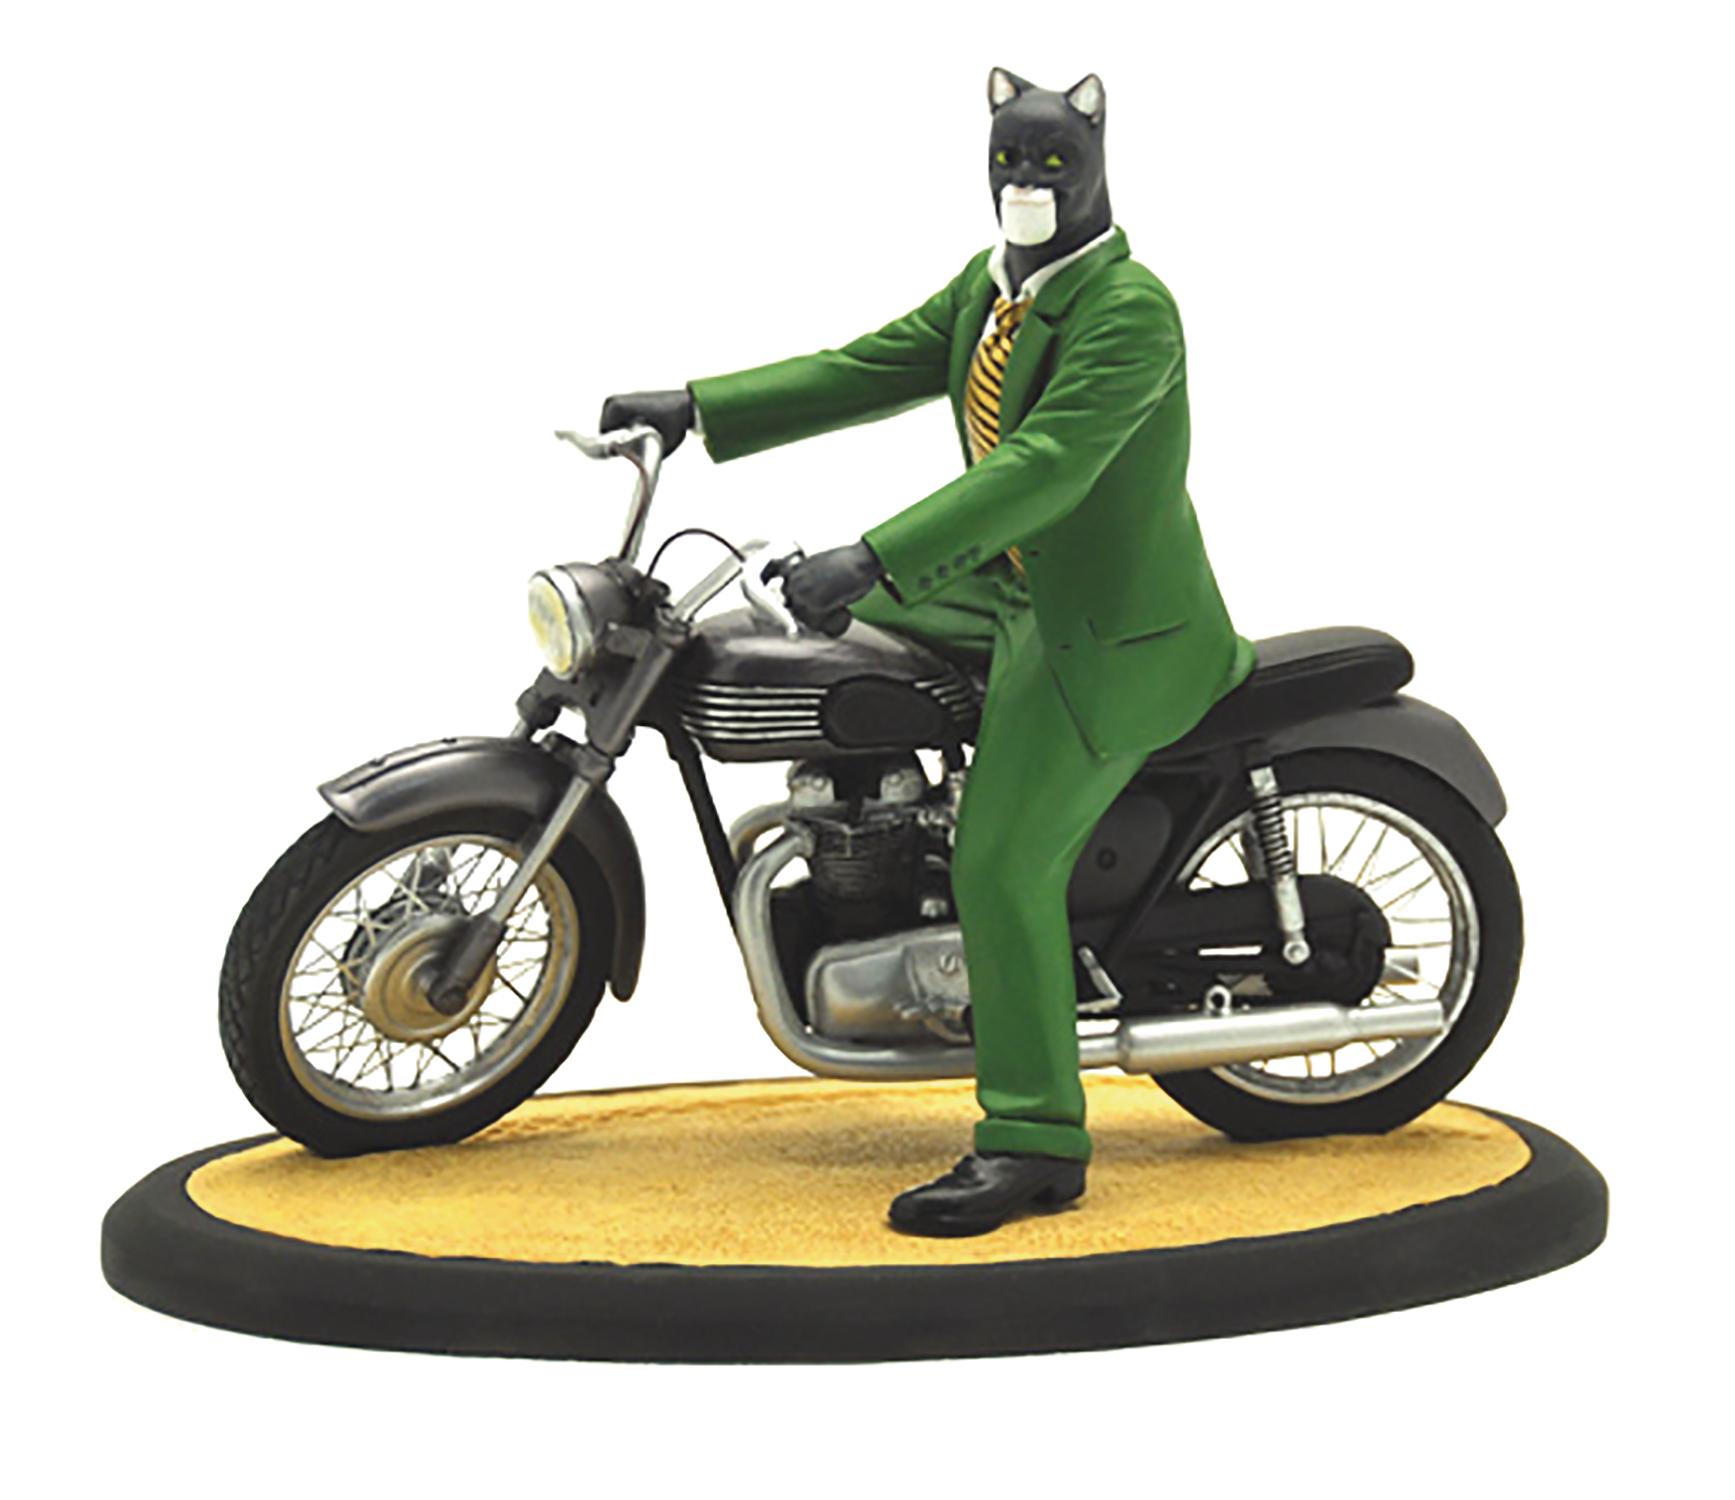 Statue of Blacksad on a Motorcycle